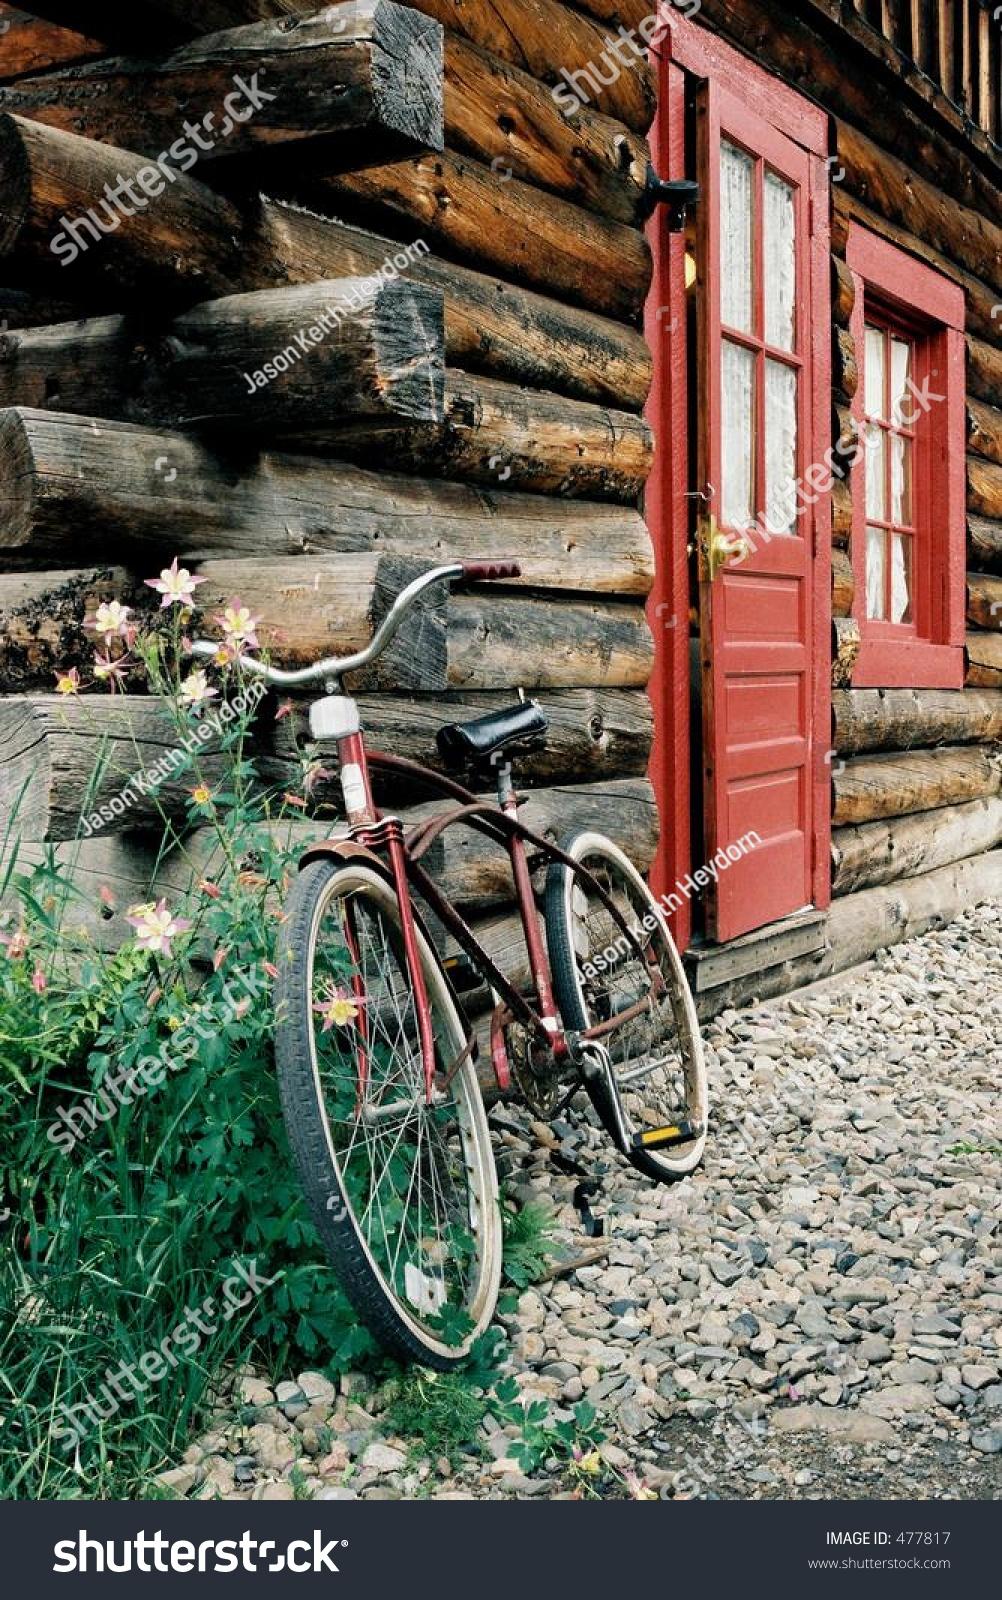 Vintage cruiser bicycle leaning against log imagen de for Caseta guarda bicicletas